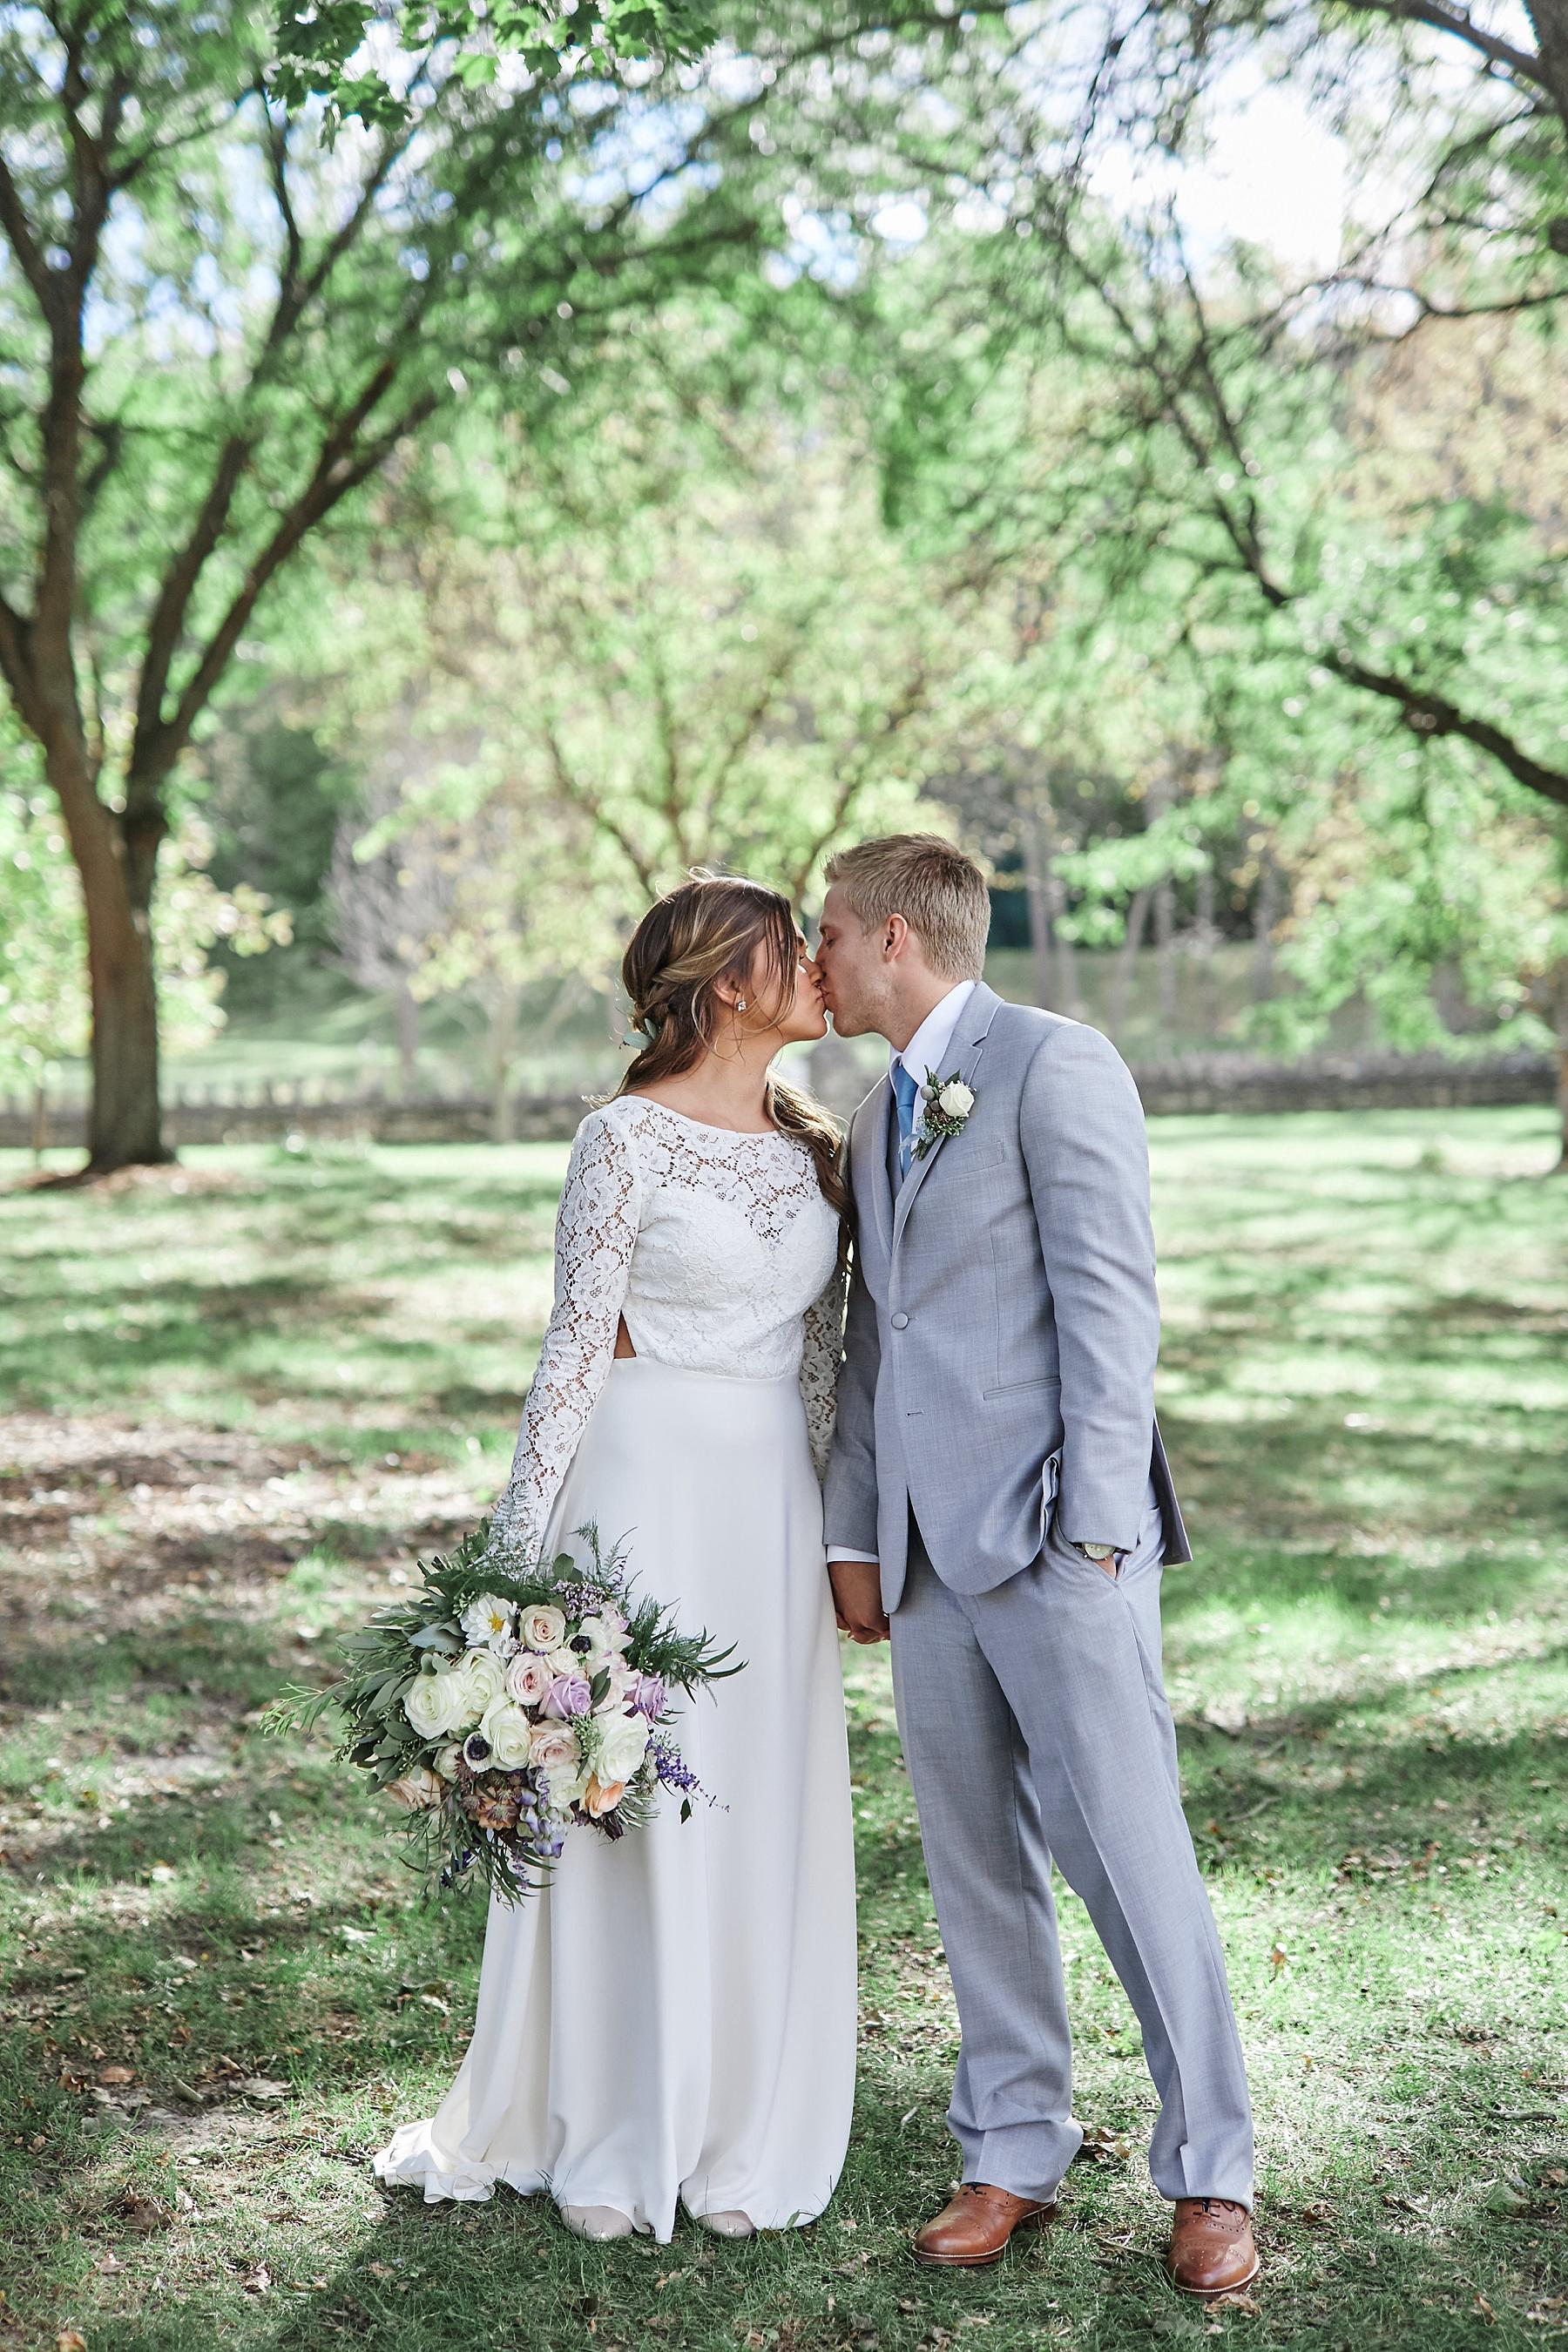 Maywood-Stone-Barn-Wedding-Rochester-Minnesota-Perry-James-Photo_0622.jpg